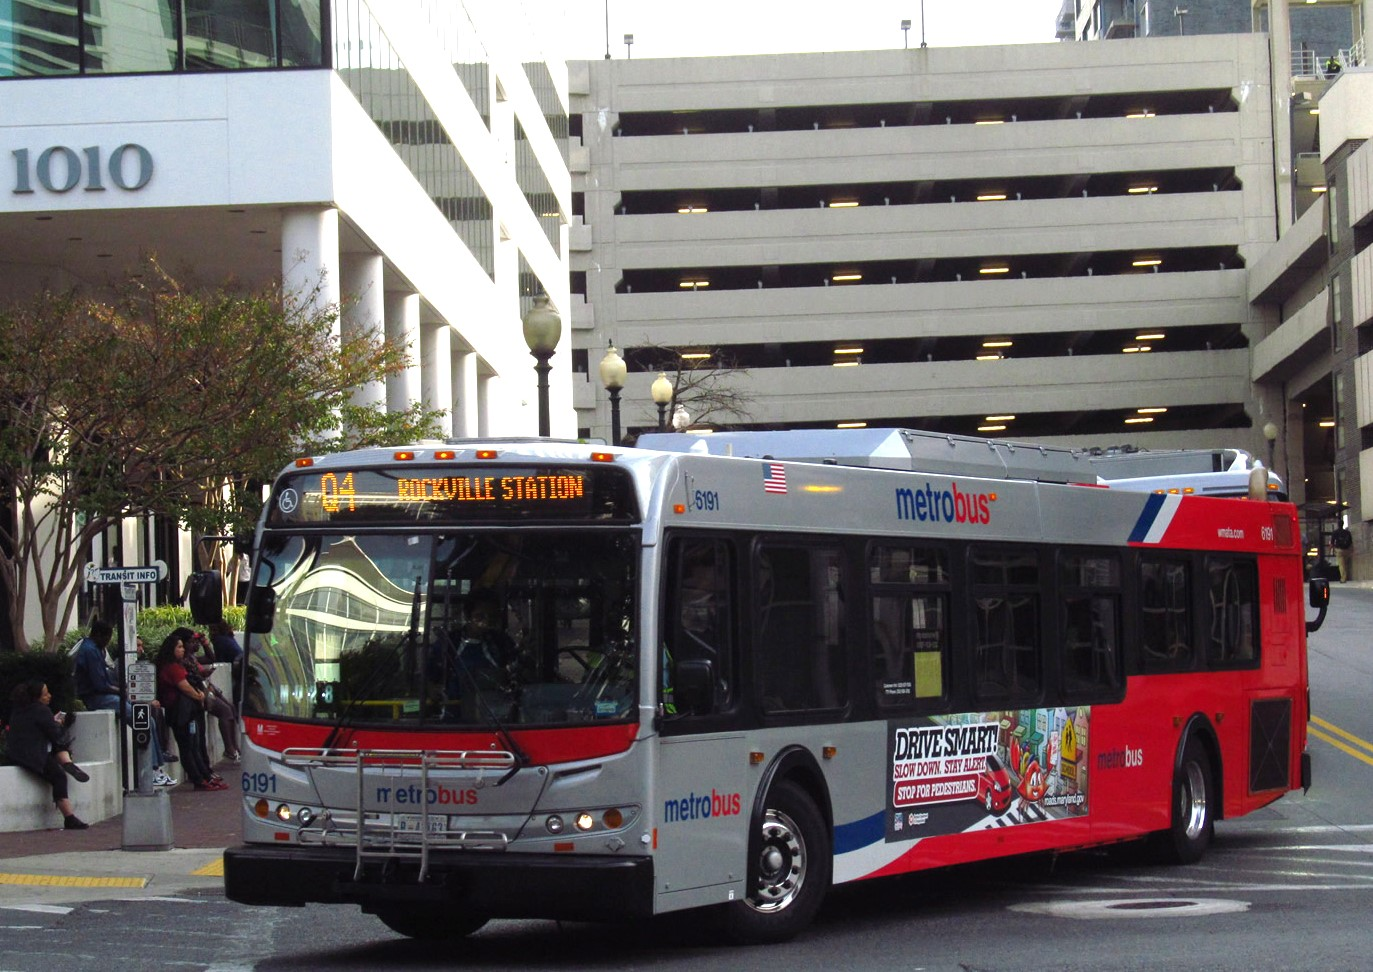 Metro Bus Cleaners Dc : Go montgomery metro seeking input on proposed bus service